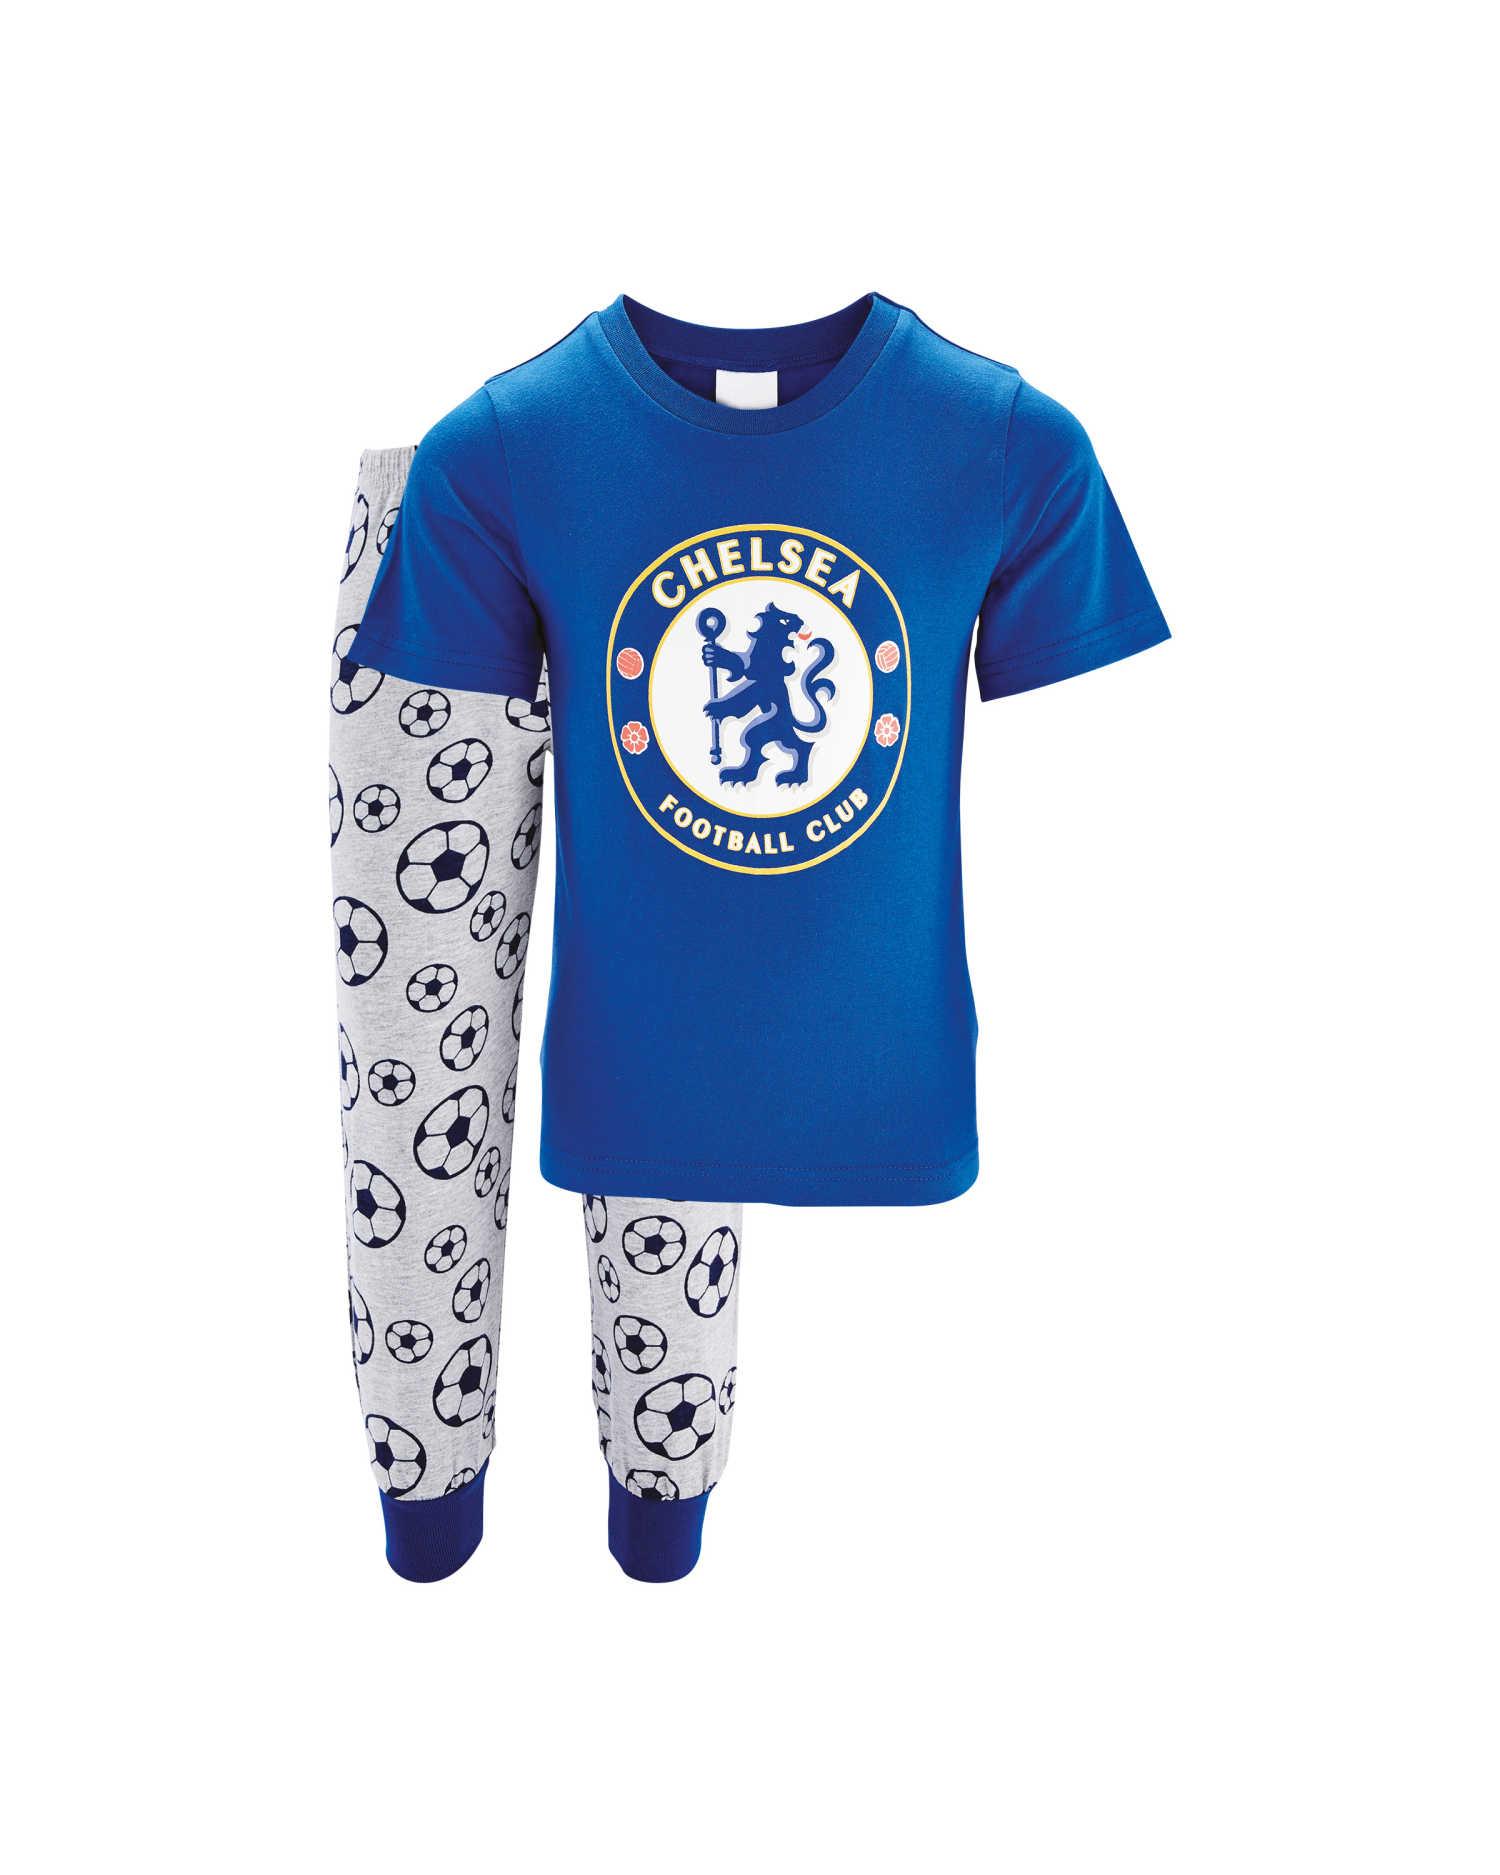 Chelsea Children's Pyjamas - £6.49 / £9.44 delivered @ Aldi